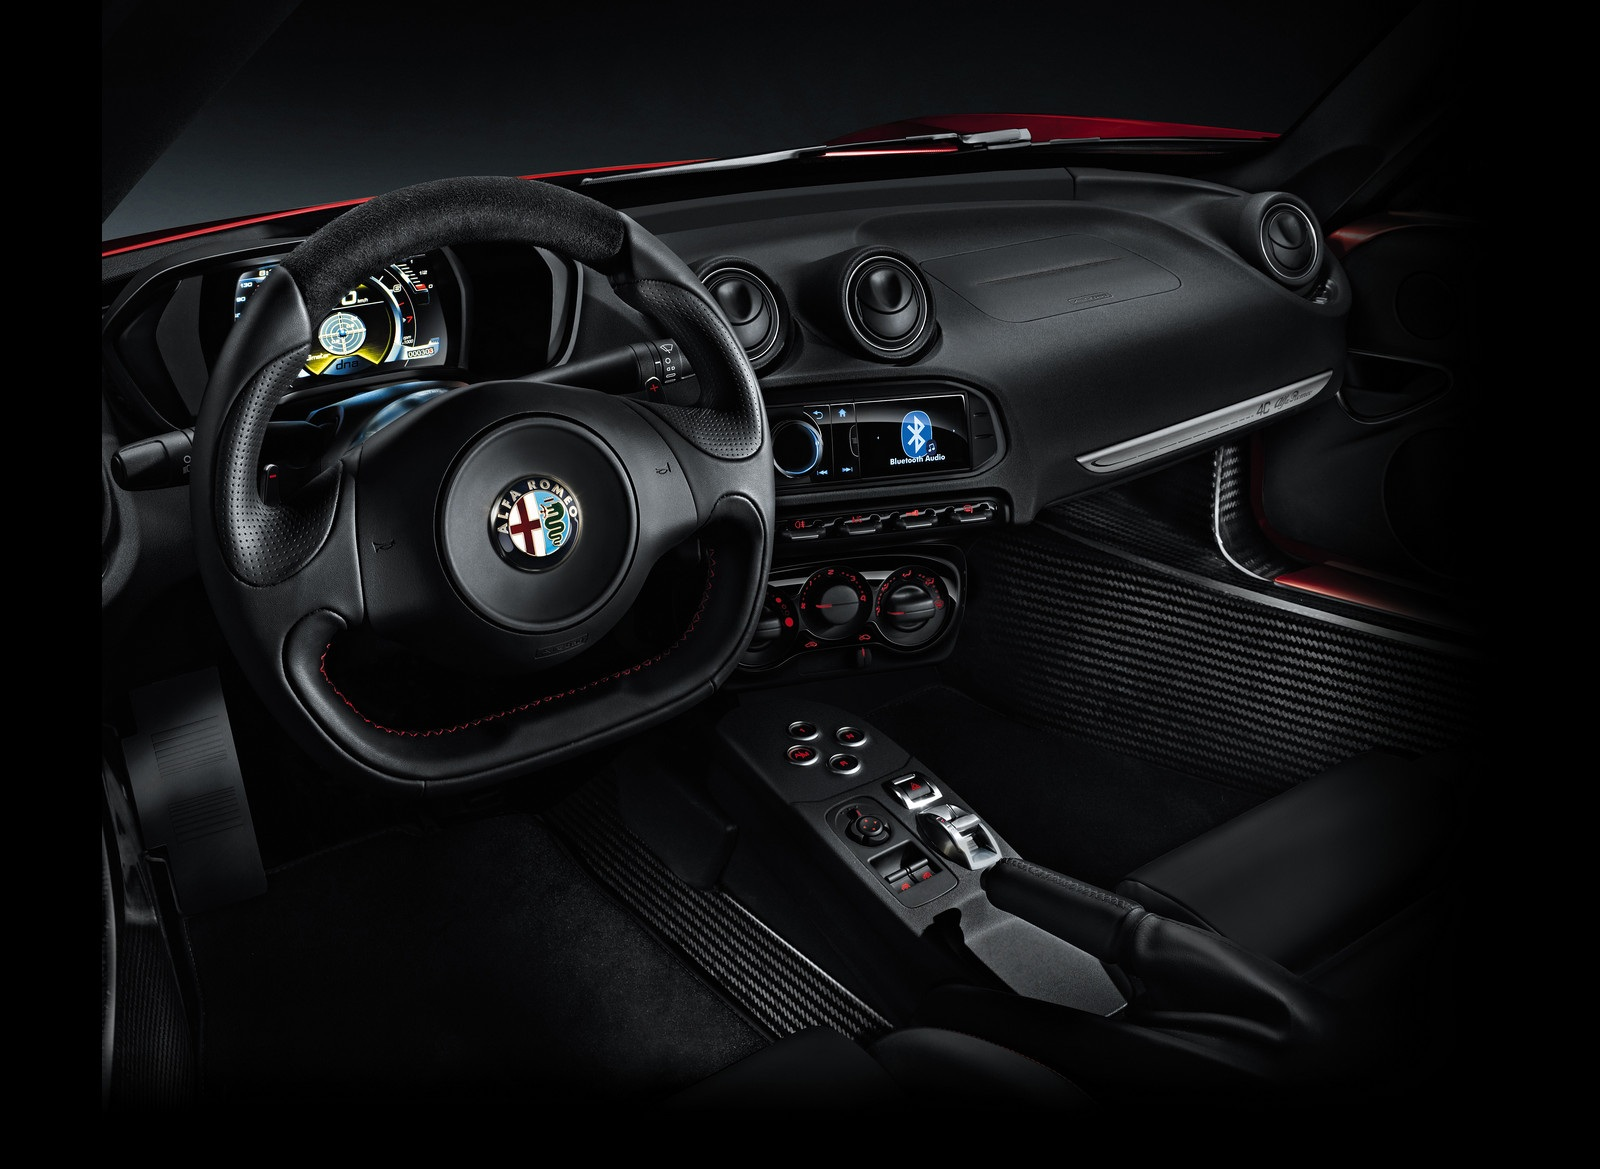 2014 Alfa Romeo 4C Interior and Dashboard